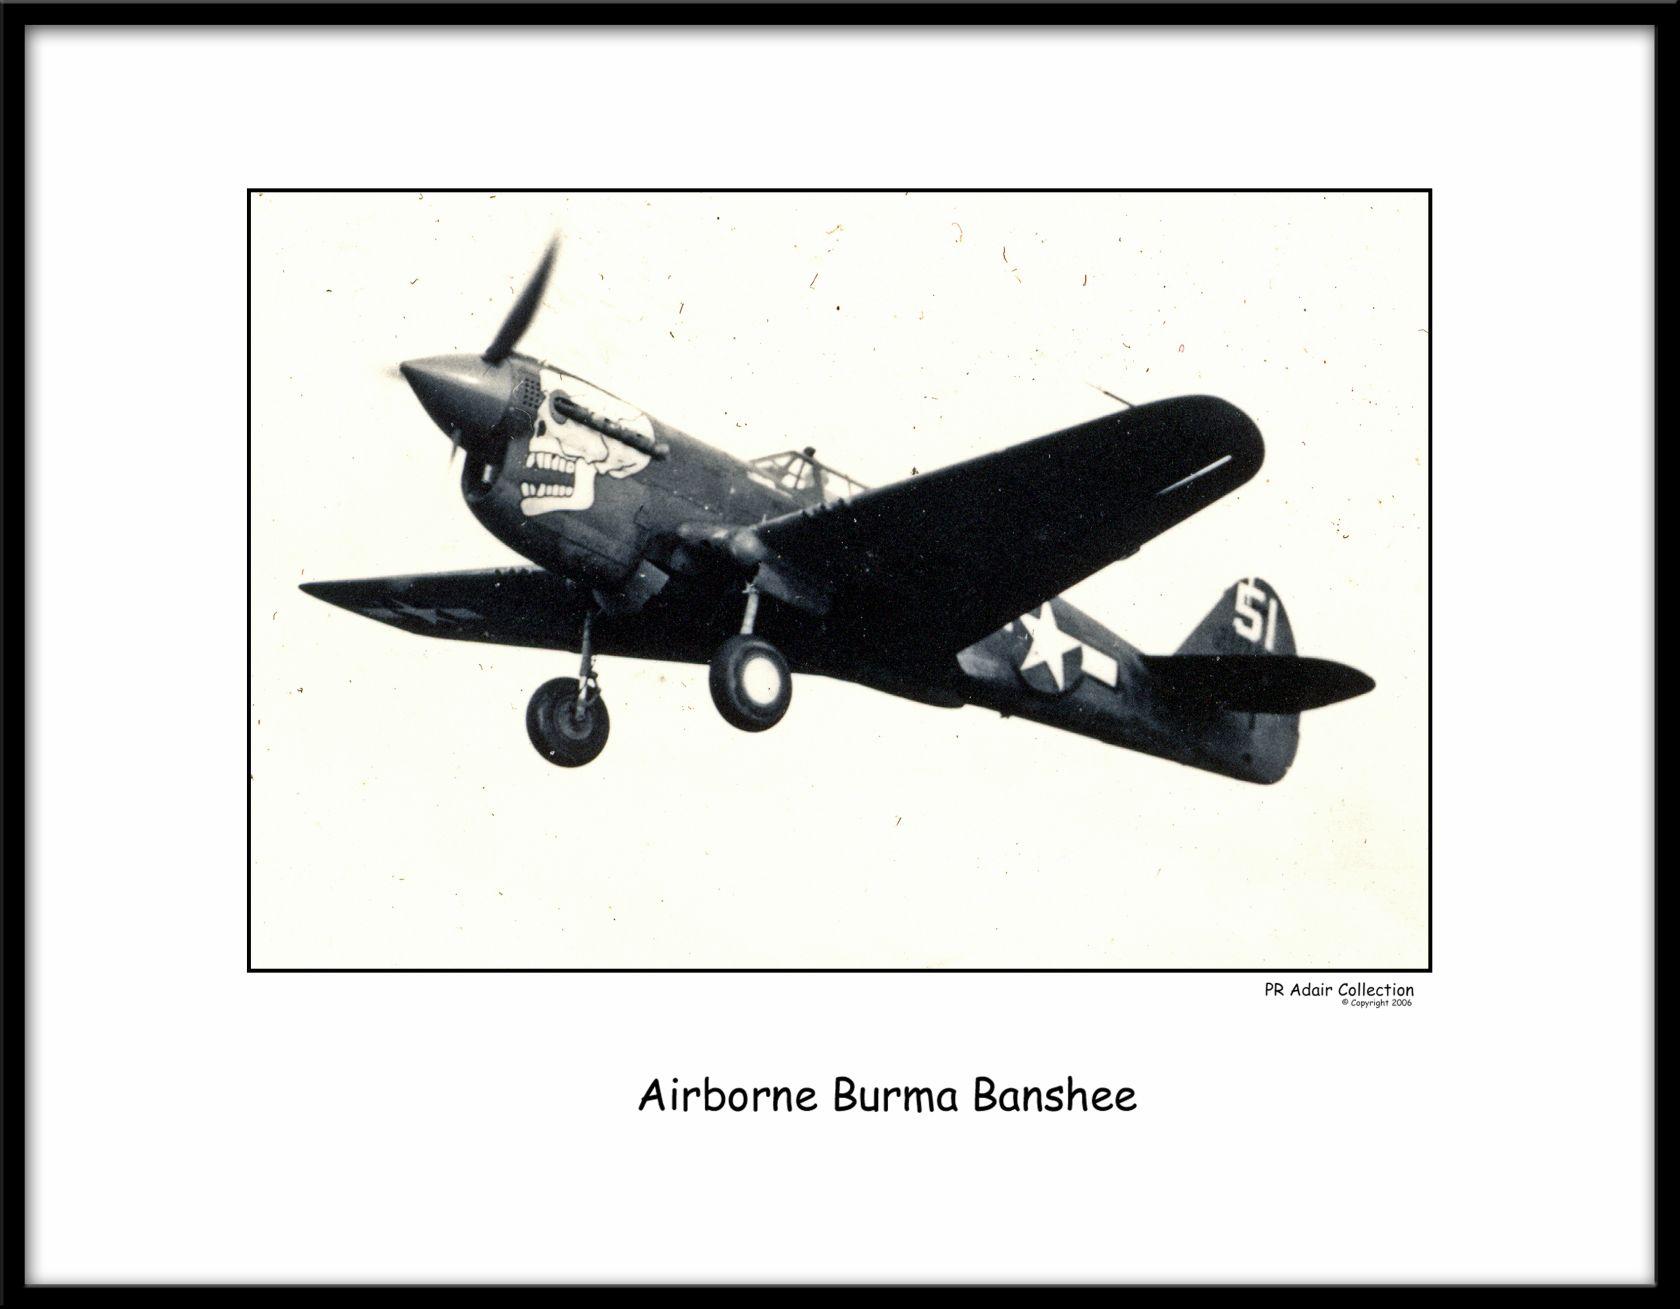 Burma Banshee 151